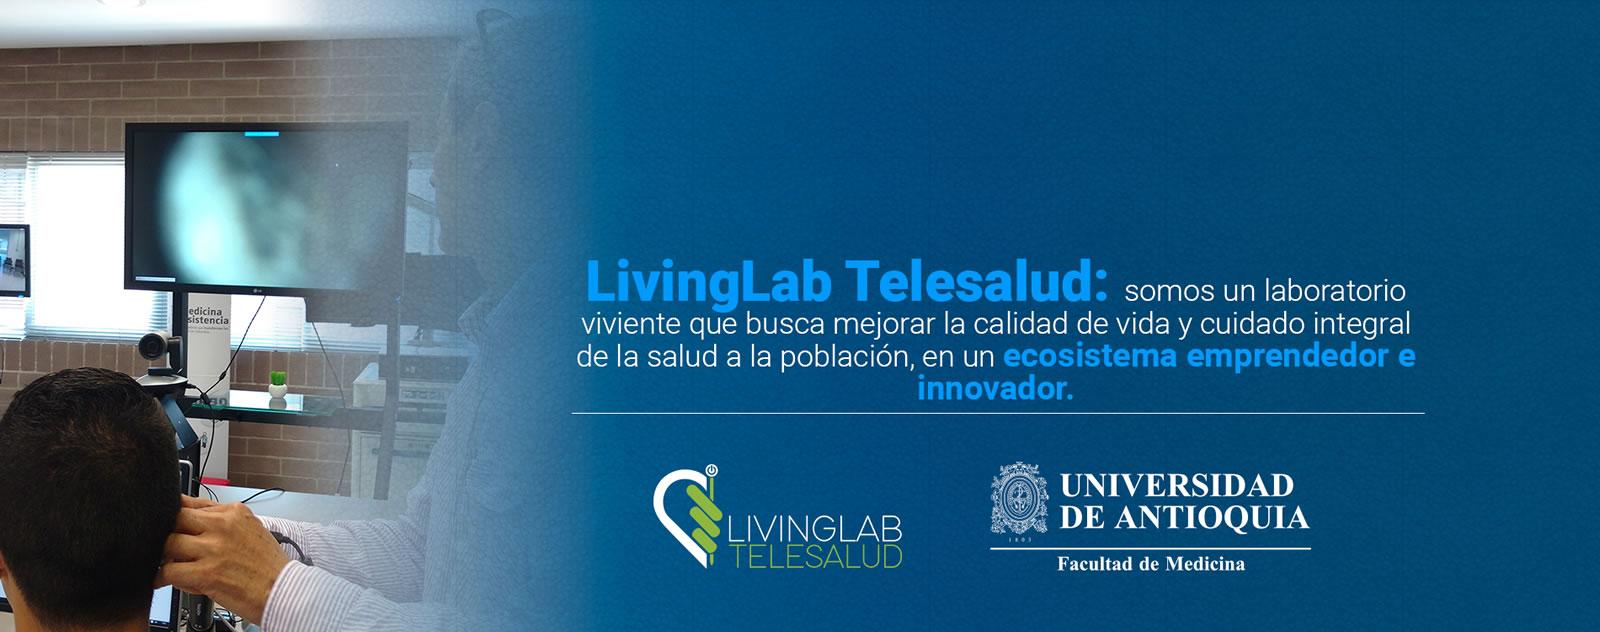 livinglab slide - PRIMER HOSPITAL DIGITAL DE LATINOAMÉRICA ESTÁ EN COLOMBIA